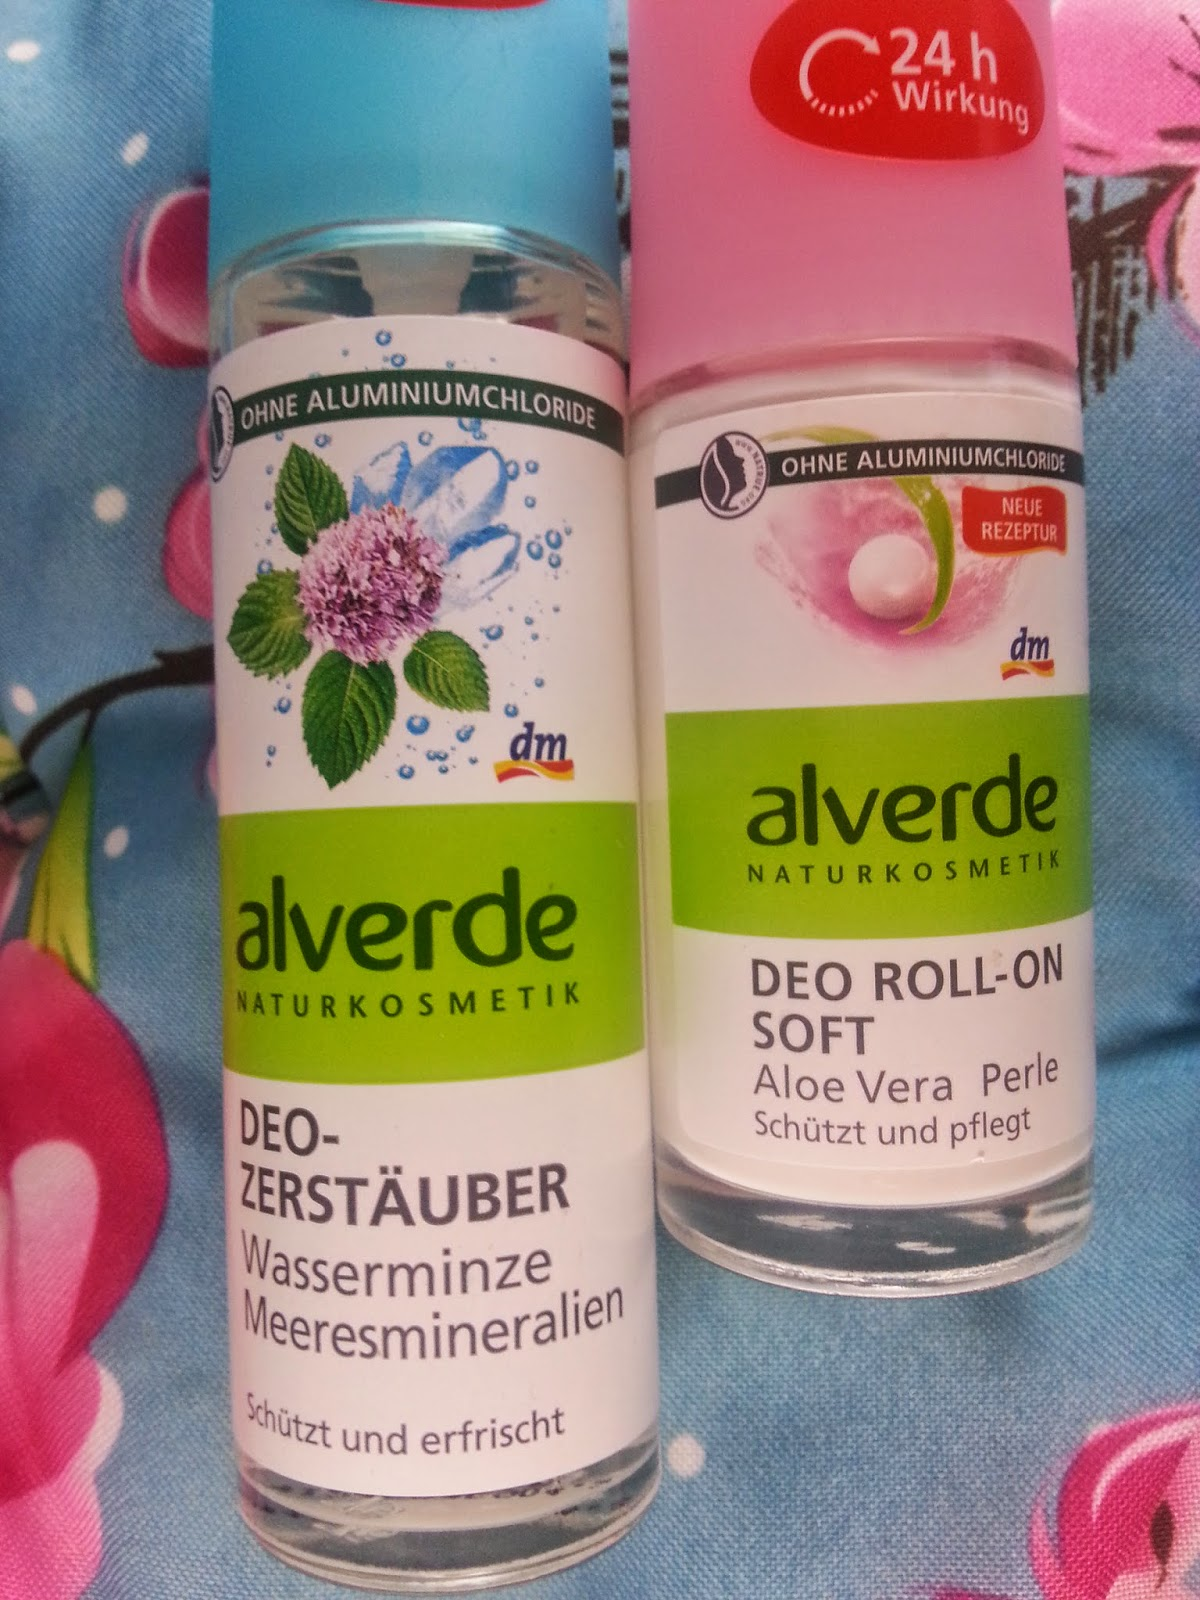 Alverde - Deo ohne Aluminium - www.annitschkasblog.de